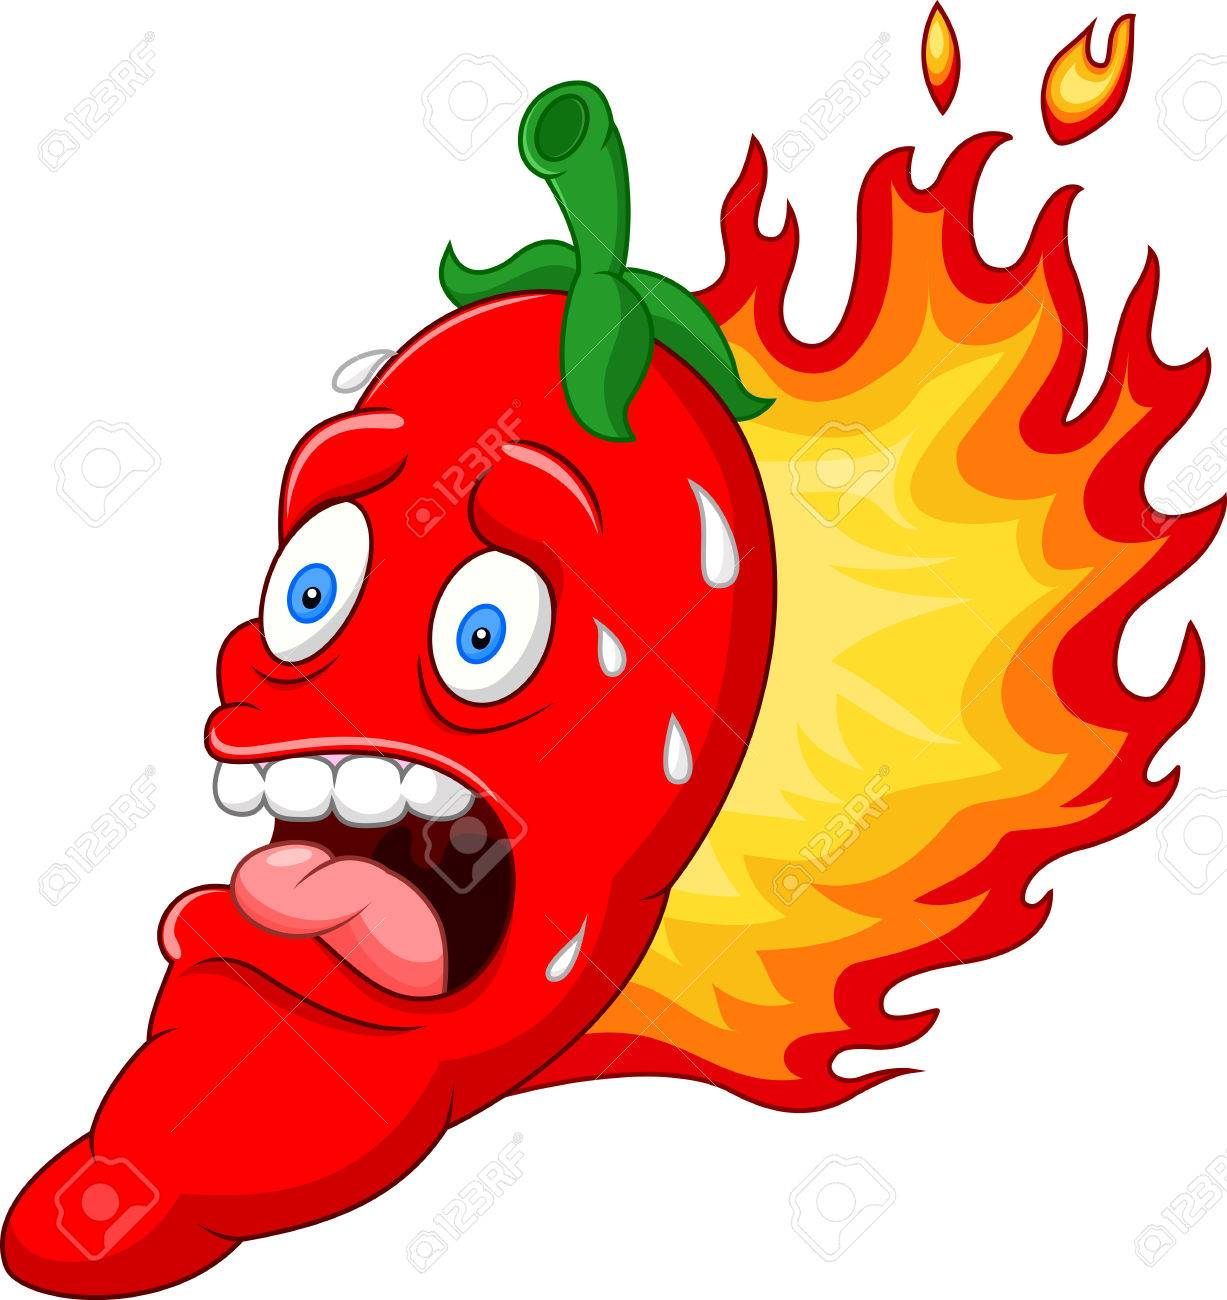 illustration of cartoon chili pepper.